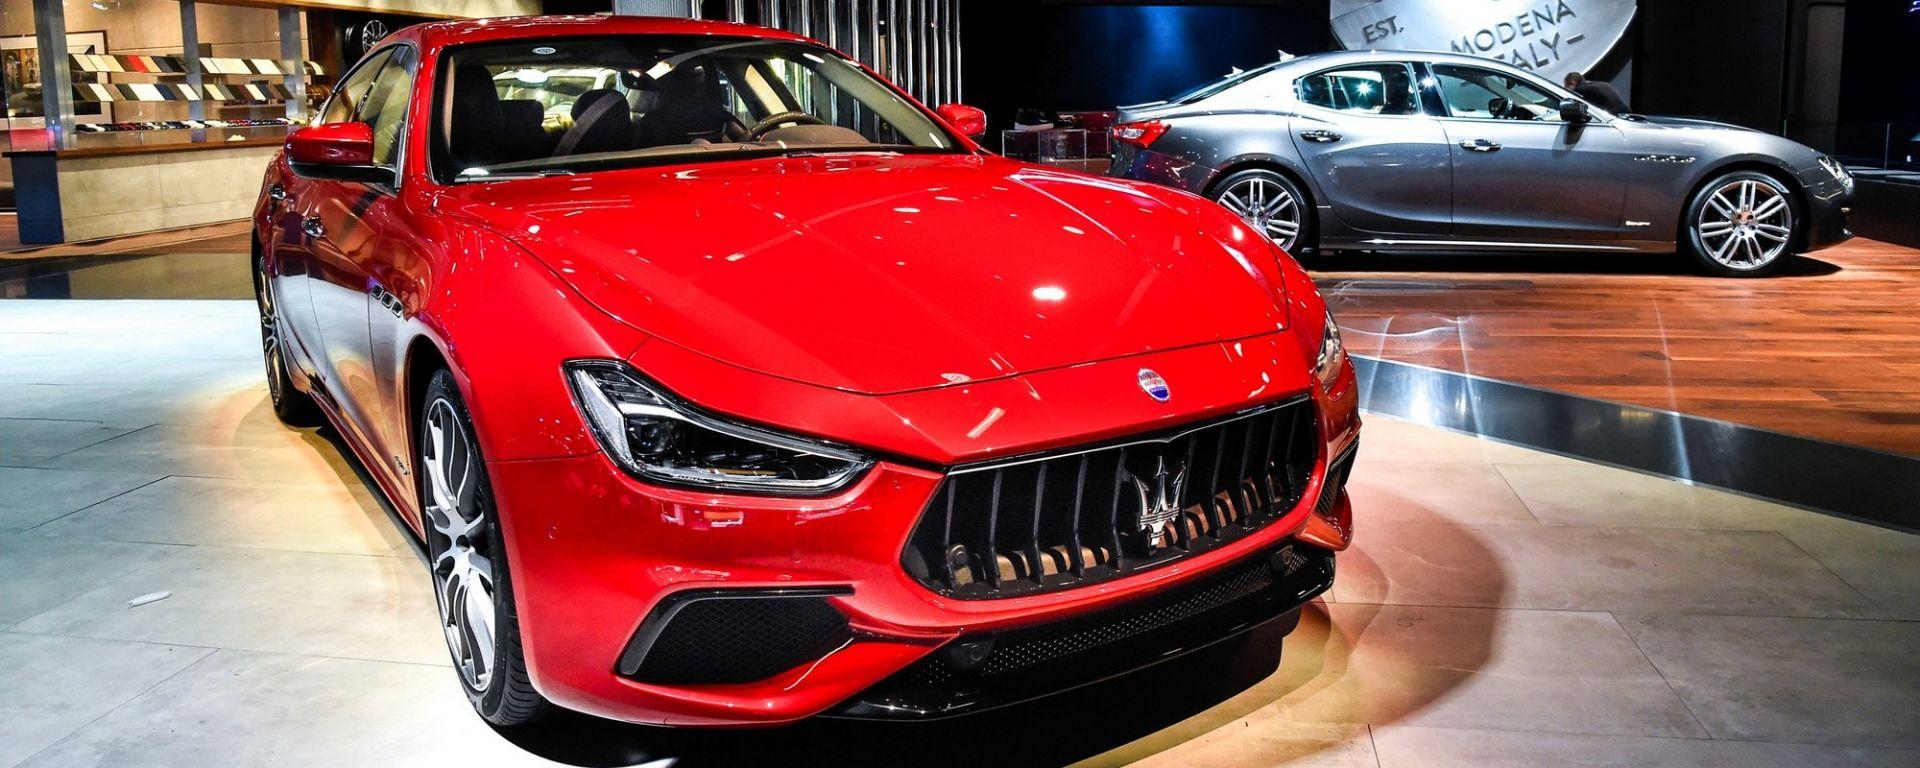 Maserati Ghibli restyling a tutta tecnologia